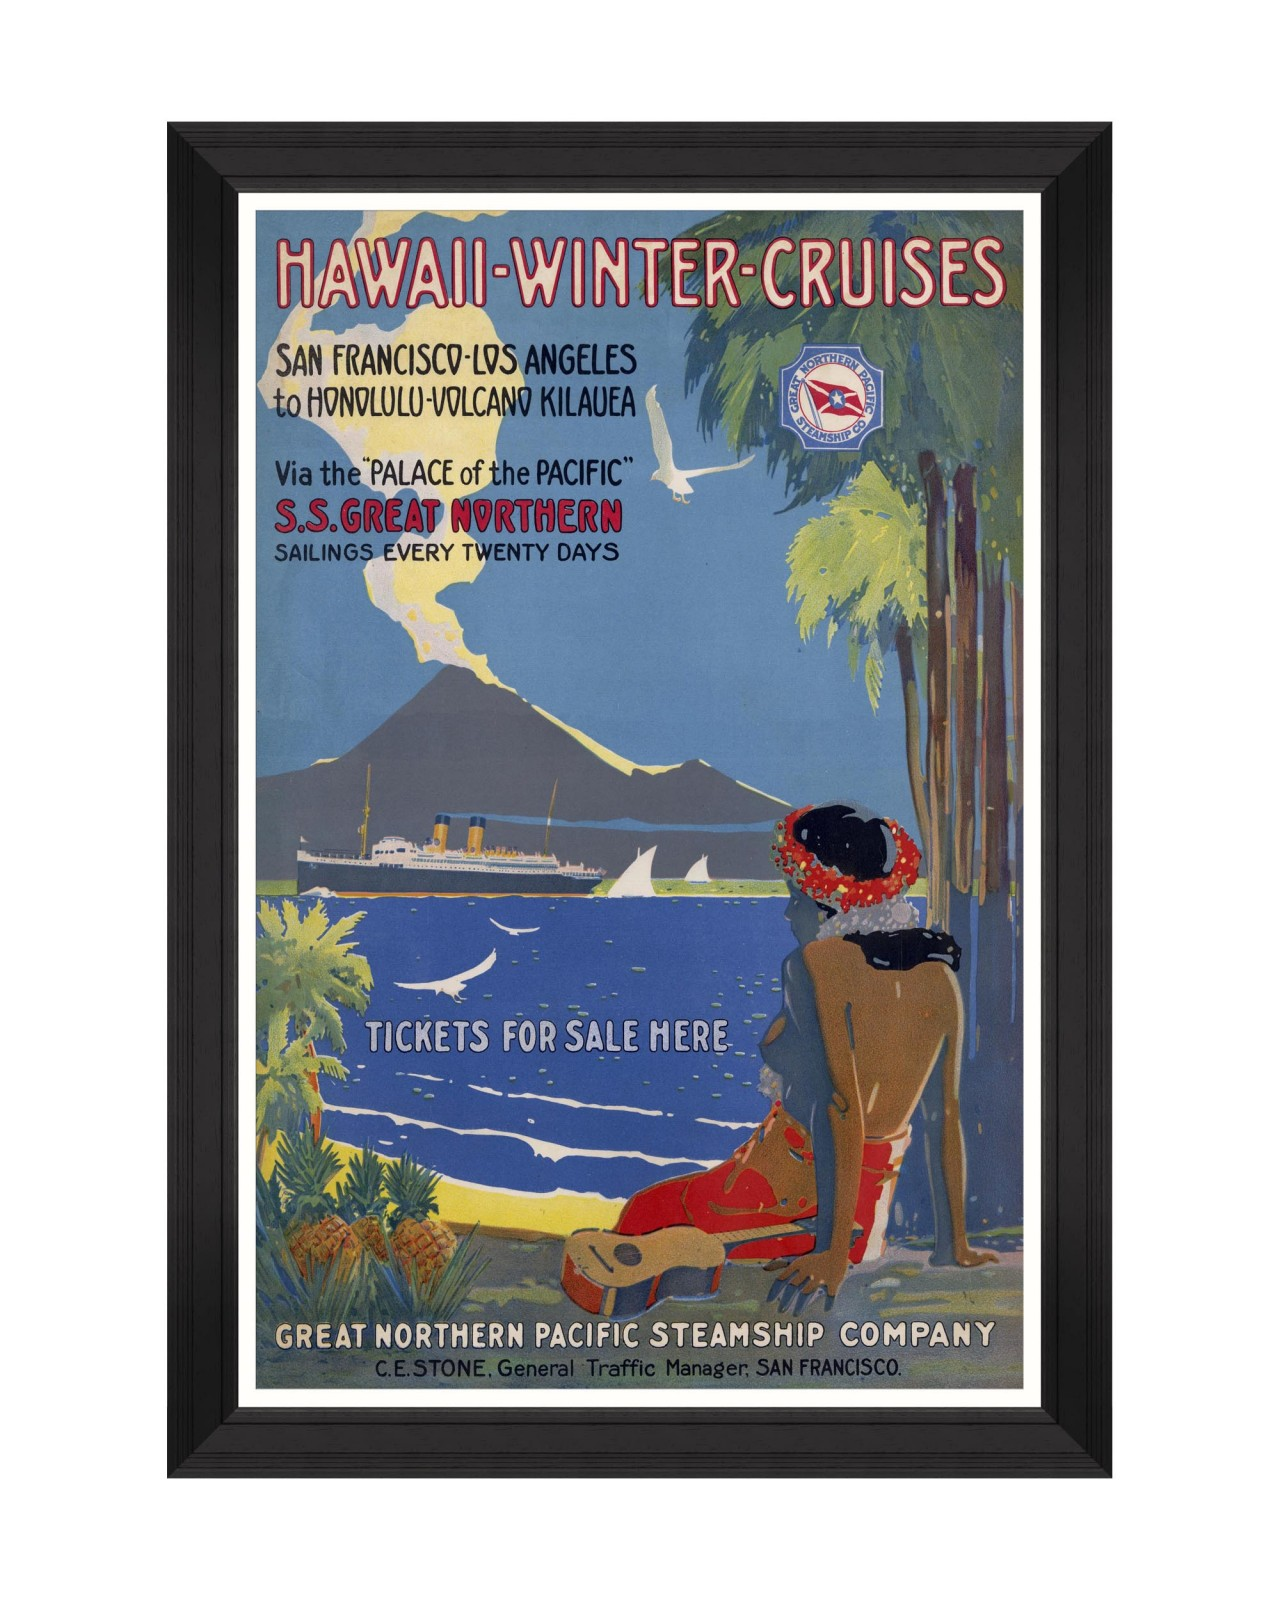 CARIBBEAN TRAVELS - HAWAII WINTER CRUISES Framed Art